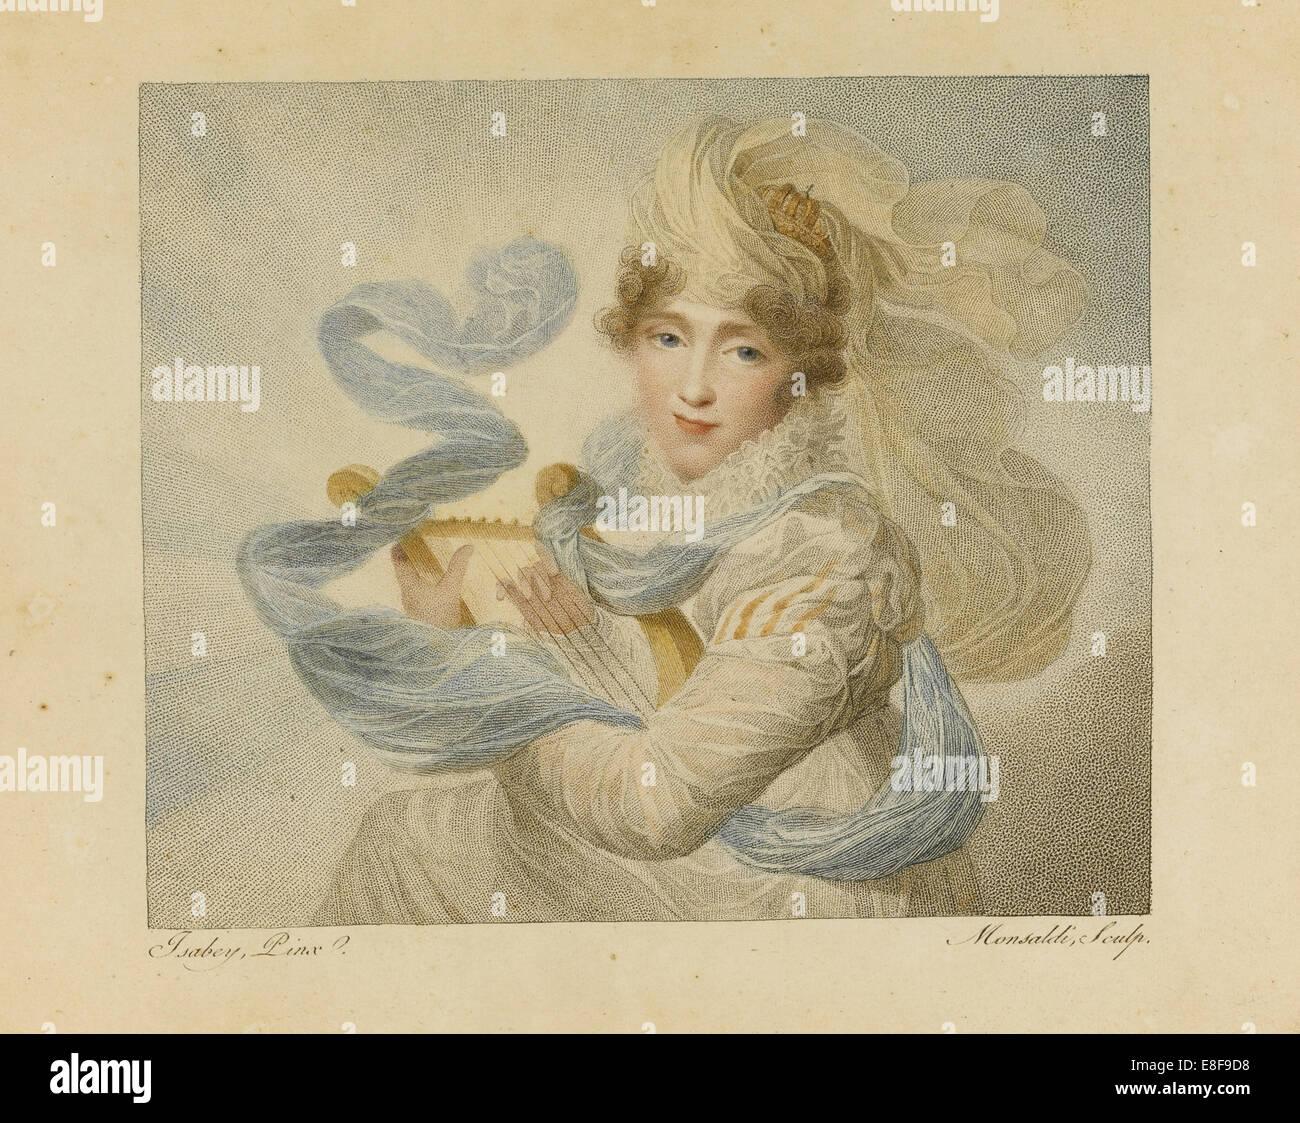 Hortense de Beauharnais. Artist: Monsaldi, Antoine Maxime (1768-1816) - Stock Image